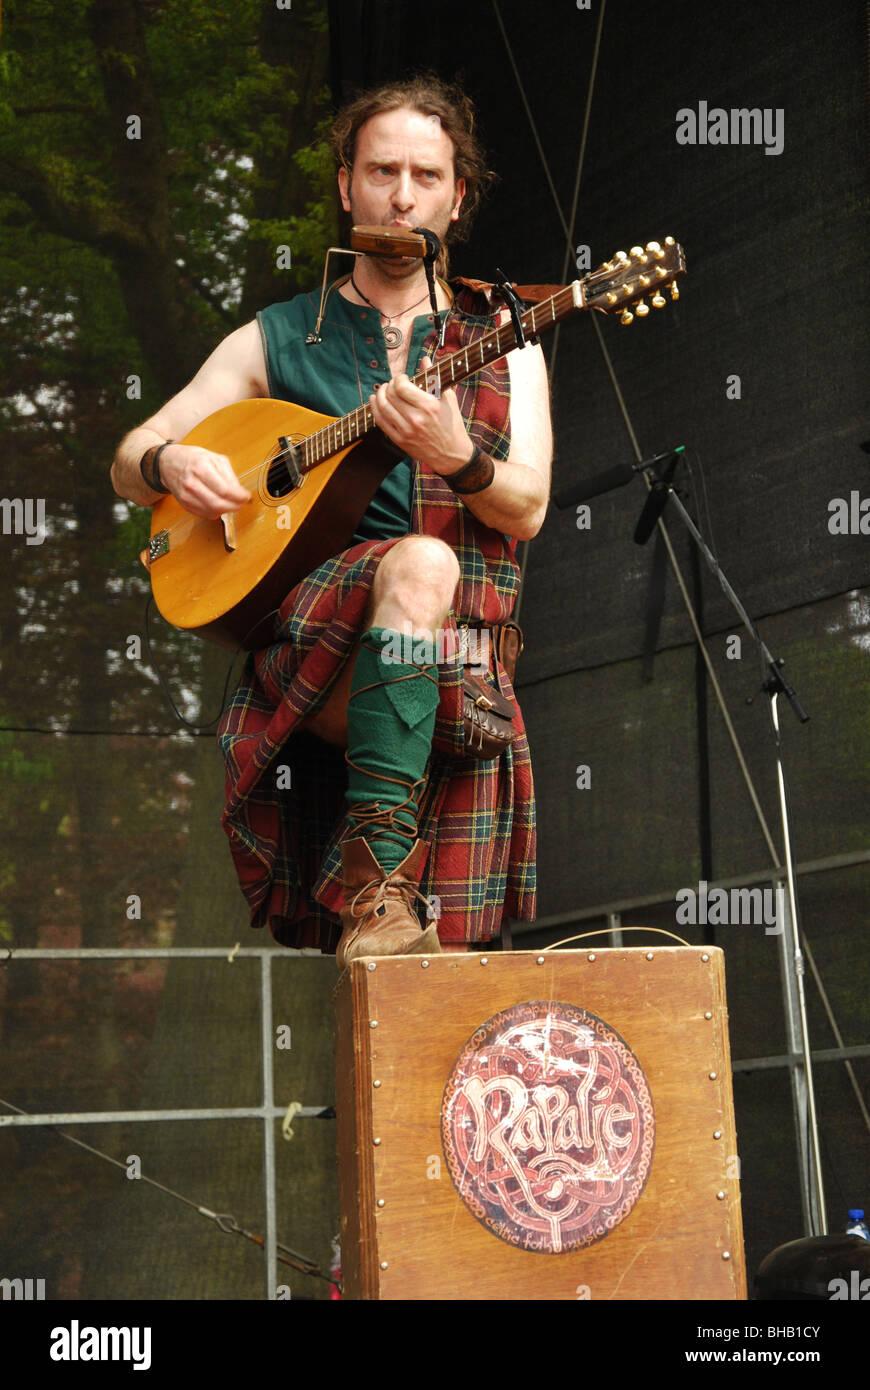 Scottish Folk Music Venue Stock Photos & Scottish Folk Music Venue